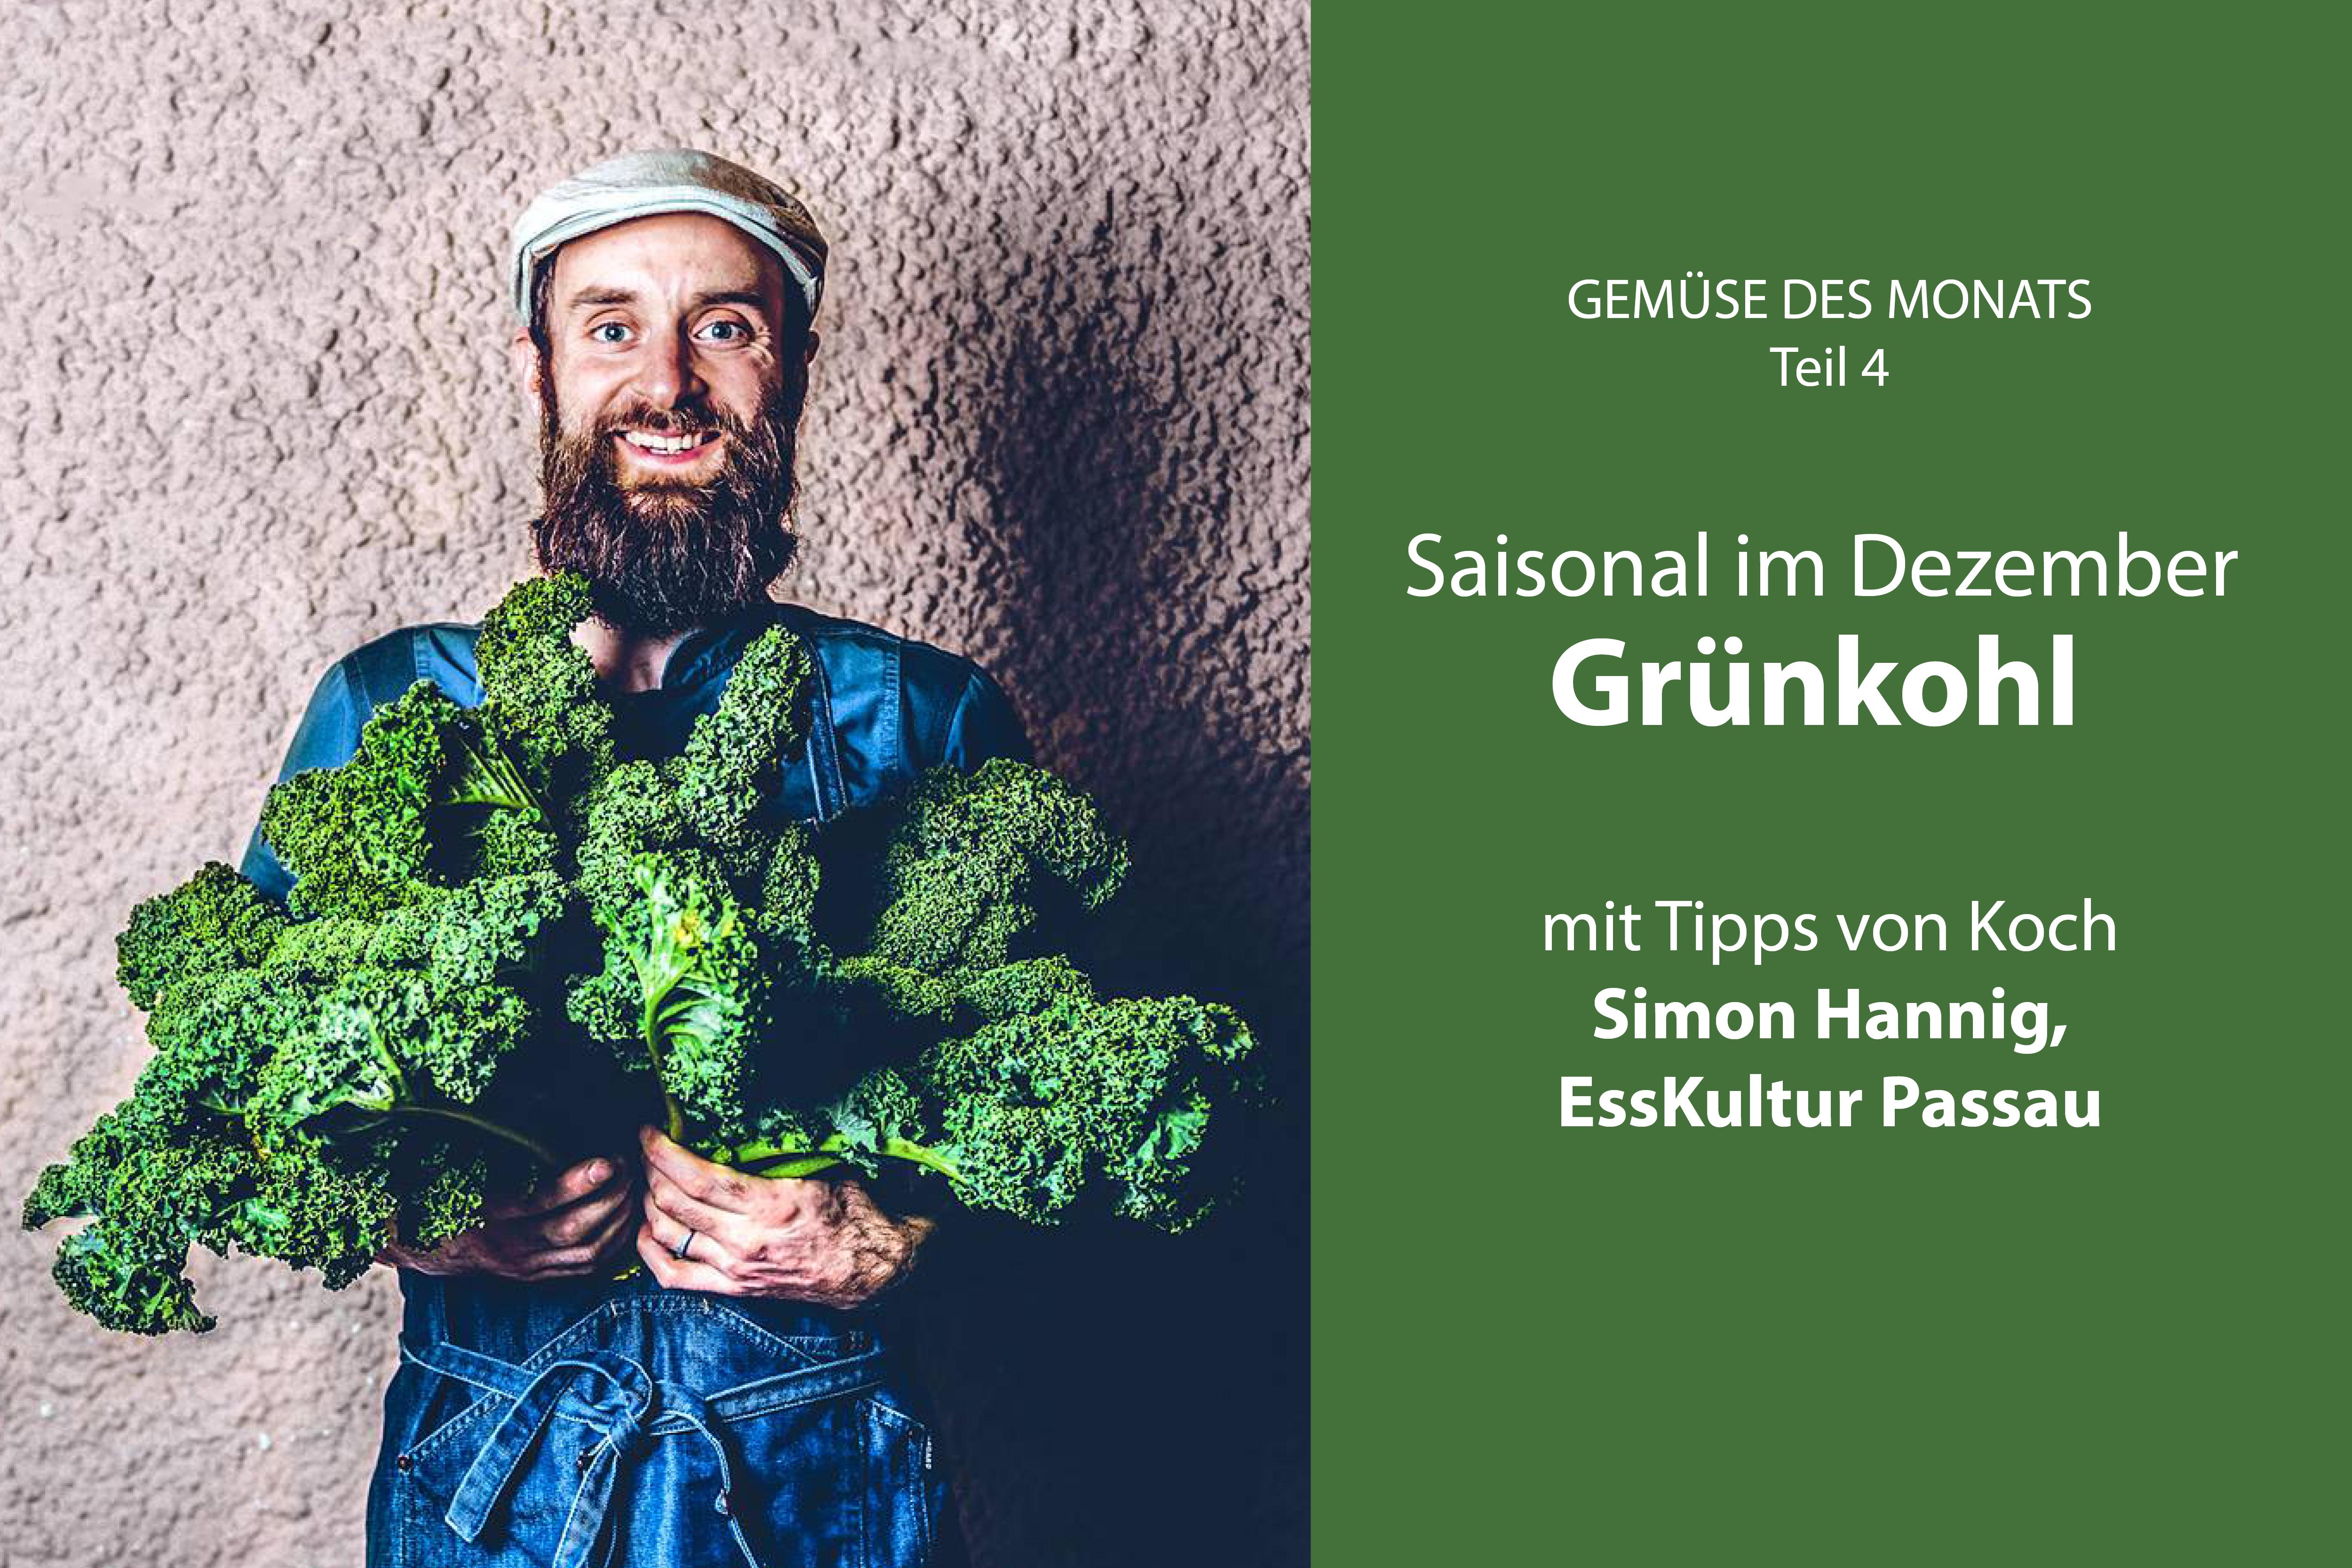 Gruenkohl Gemuese des Monats